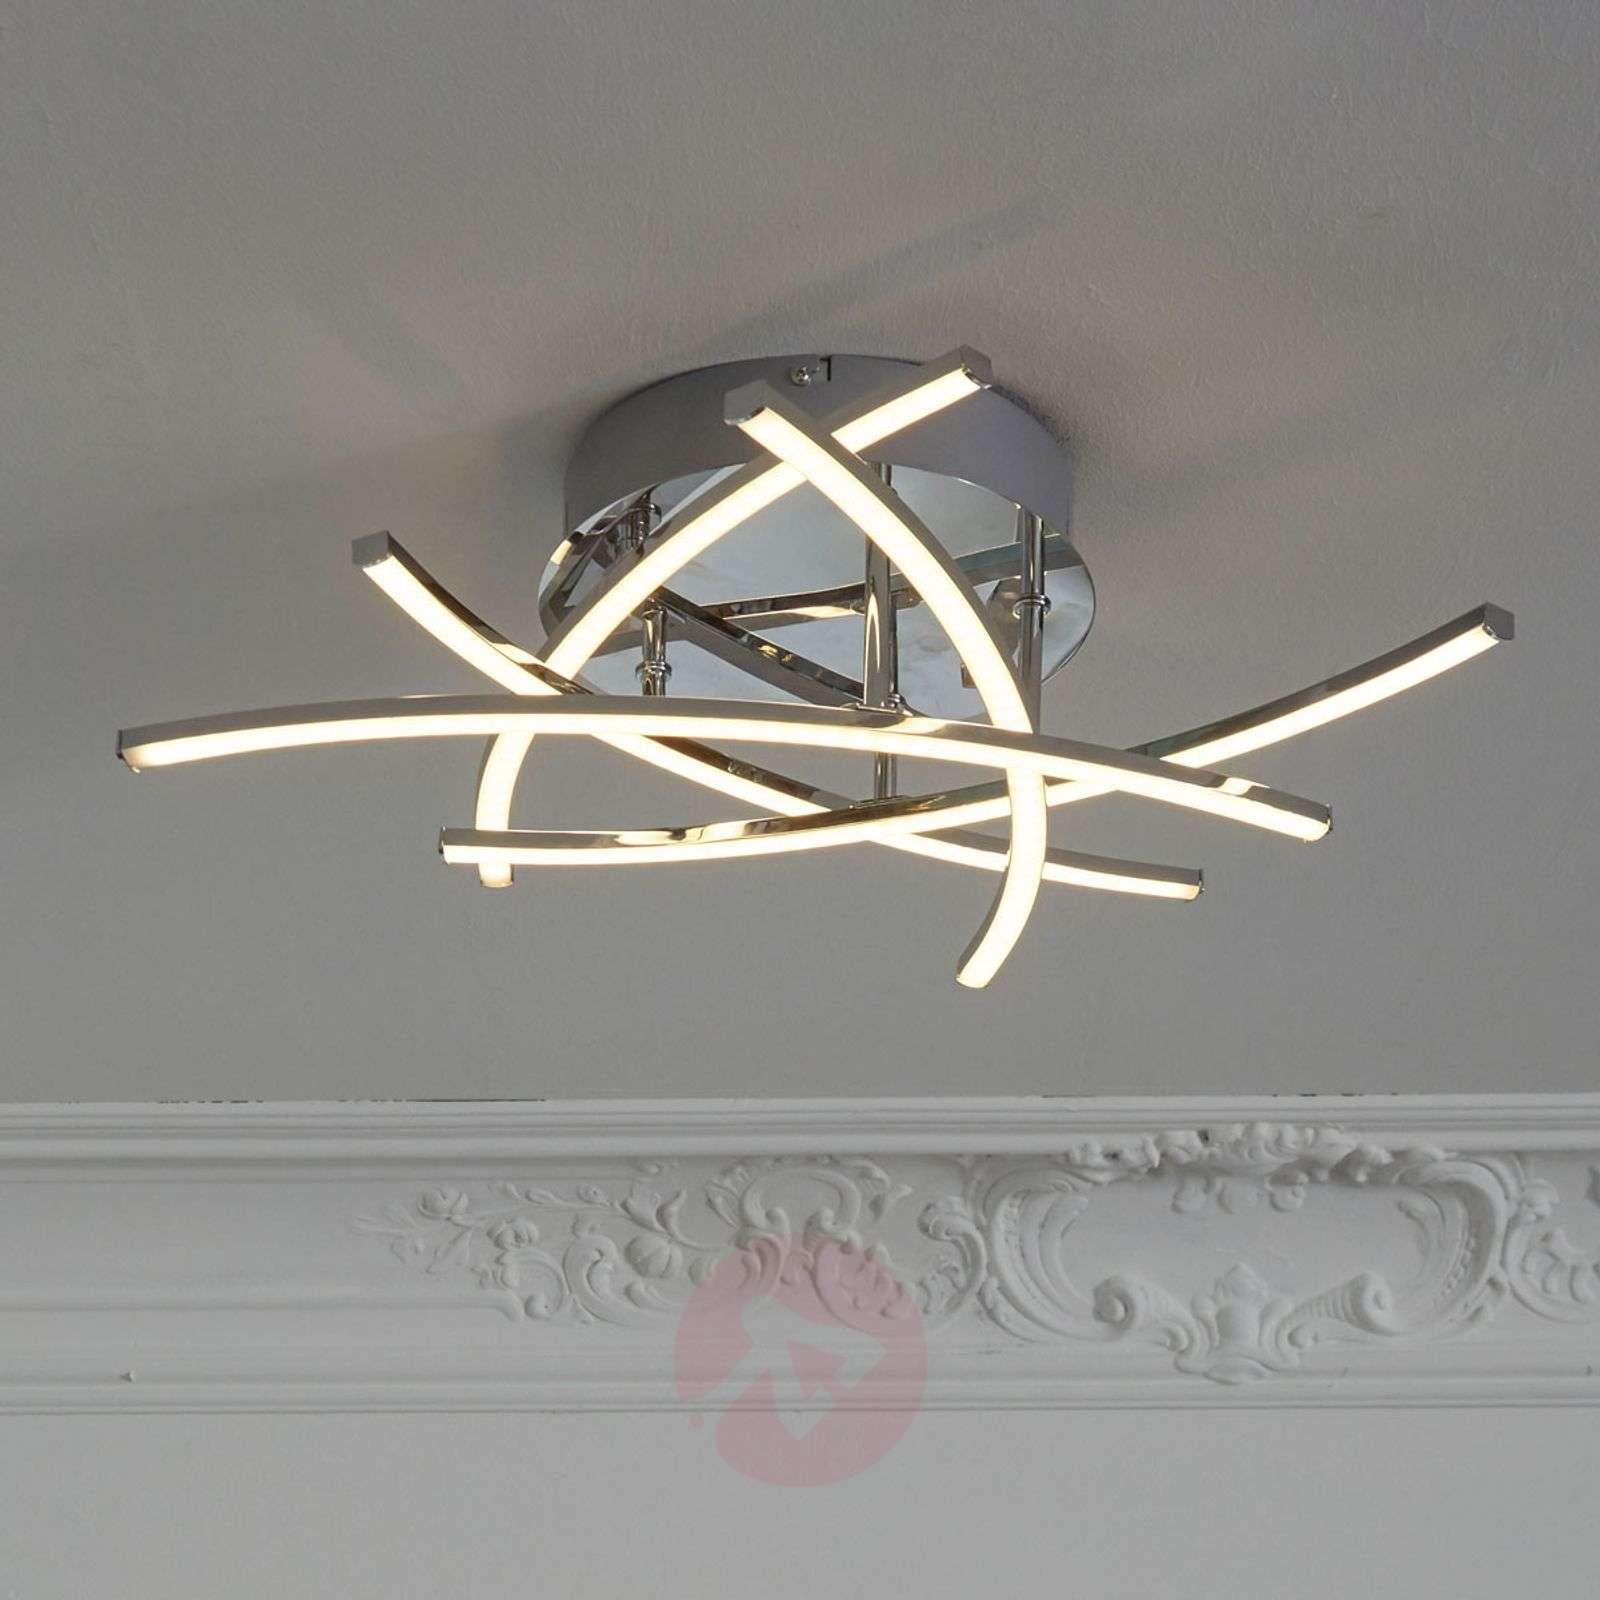 LED-kattovalo Cross, tunable white 5 lamppua kromi-4581570-01